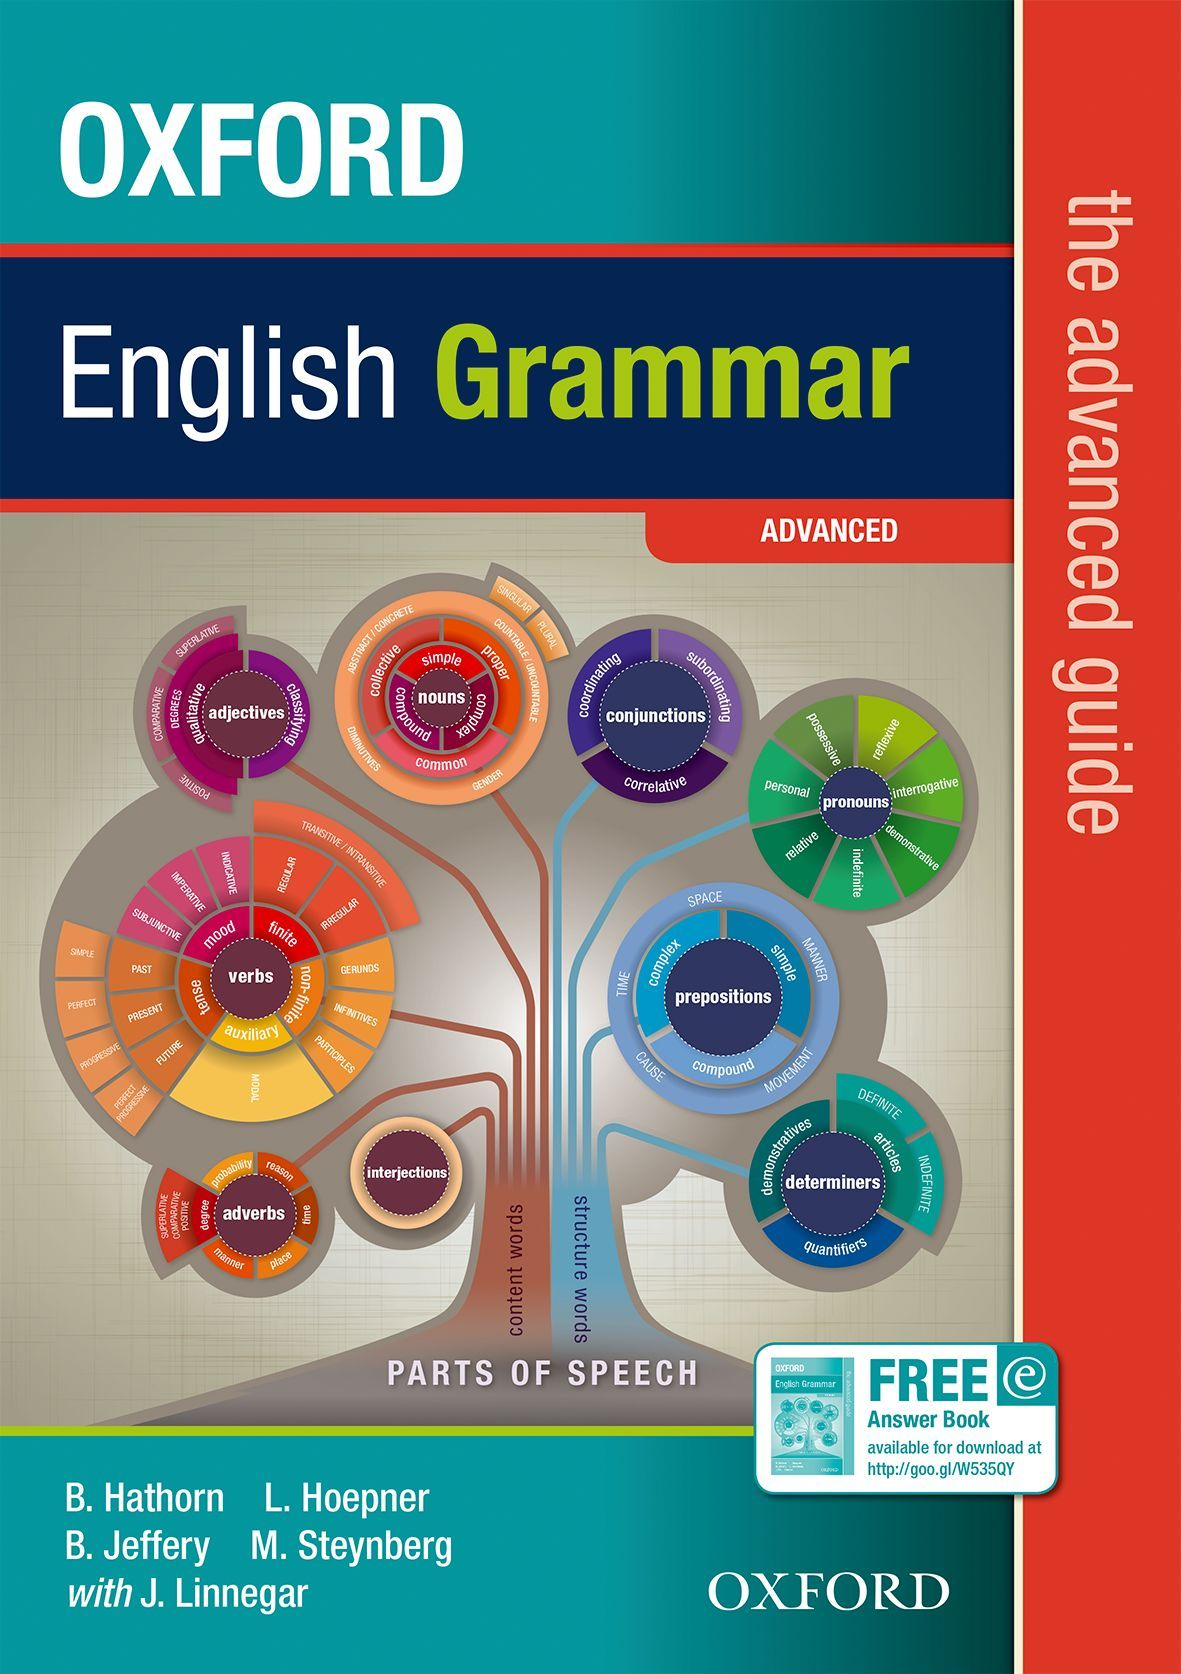 Oxford University Press :: Oxford English Grammar: The